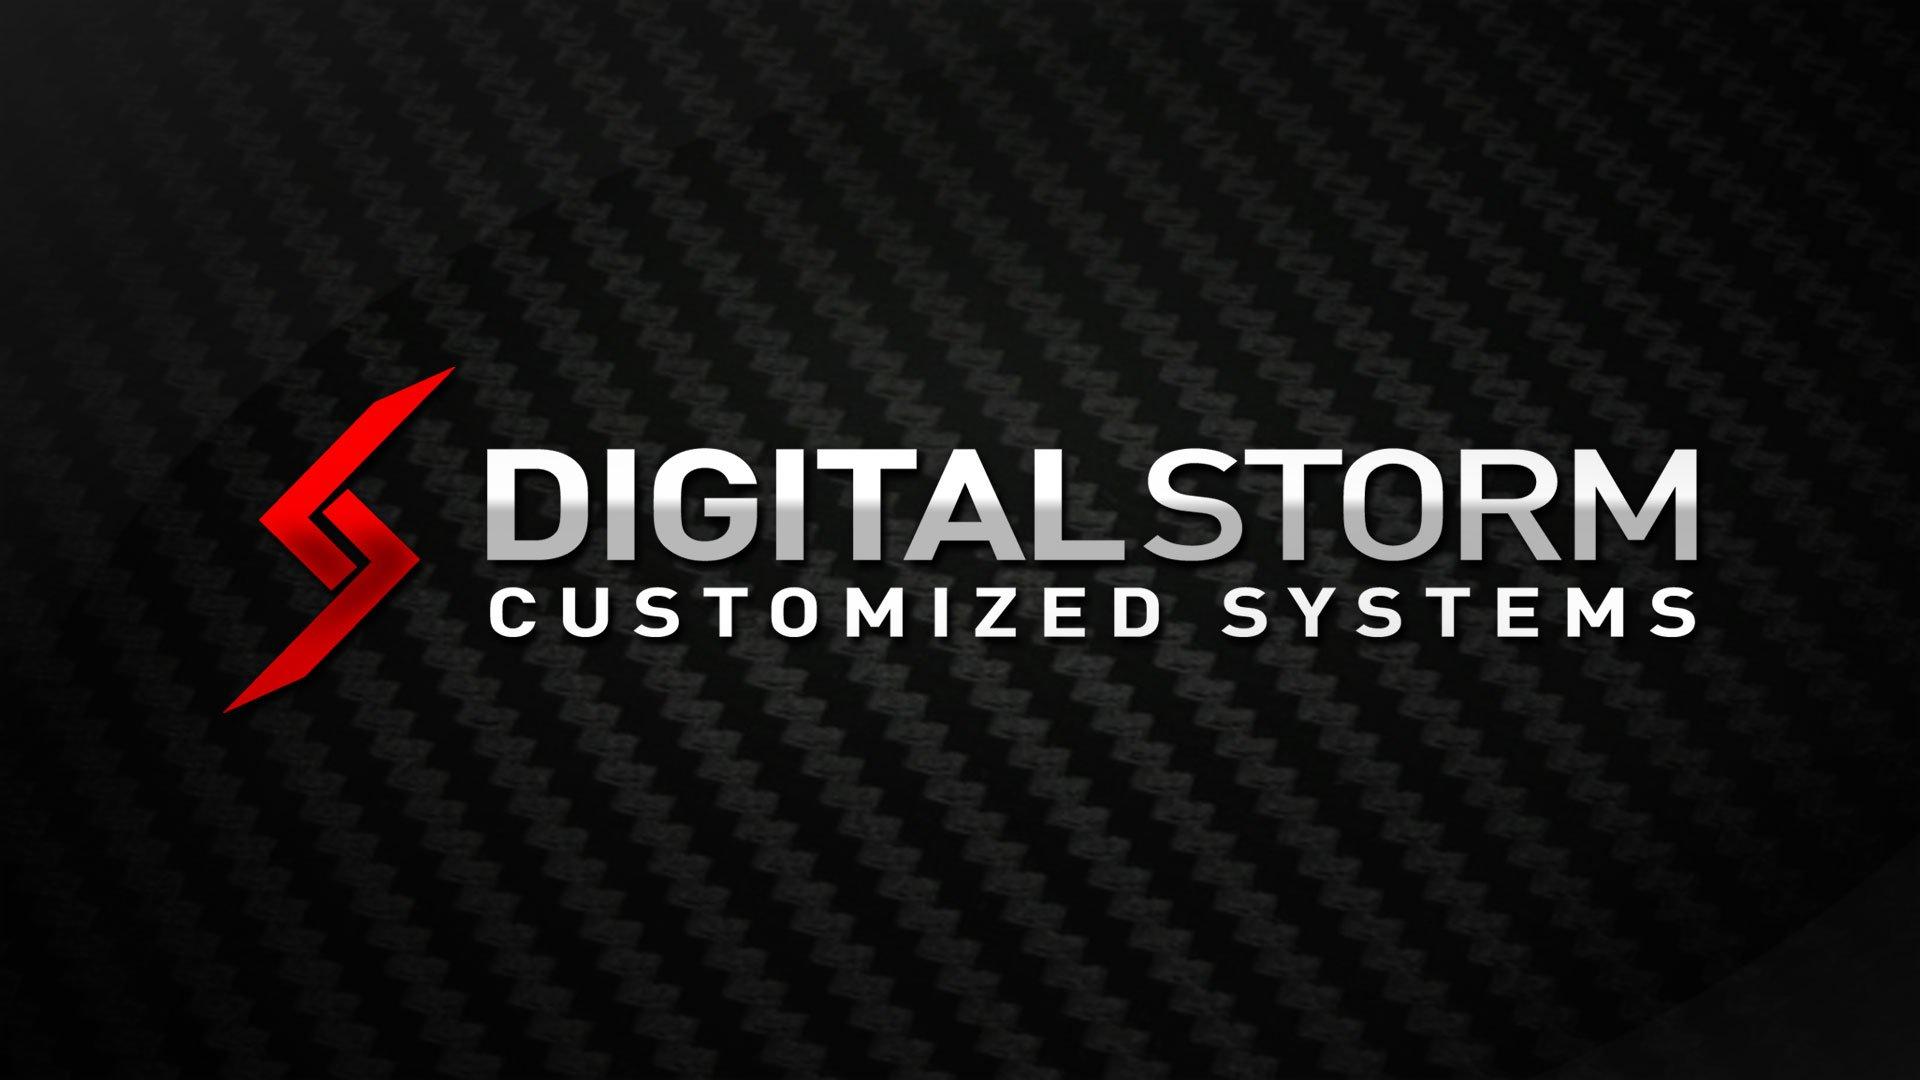 digital storm wallpapers 1920x1200 -#main